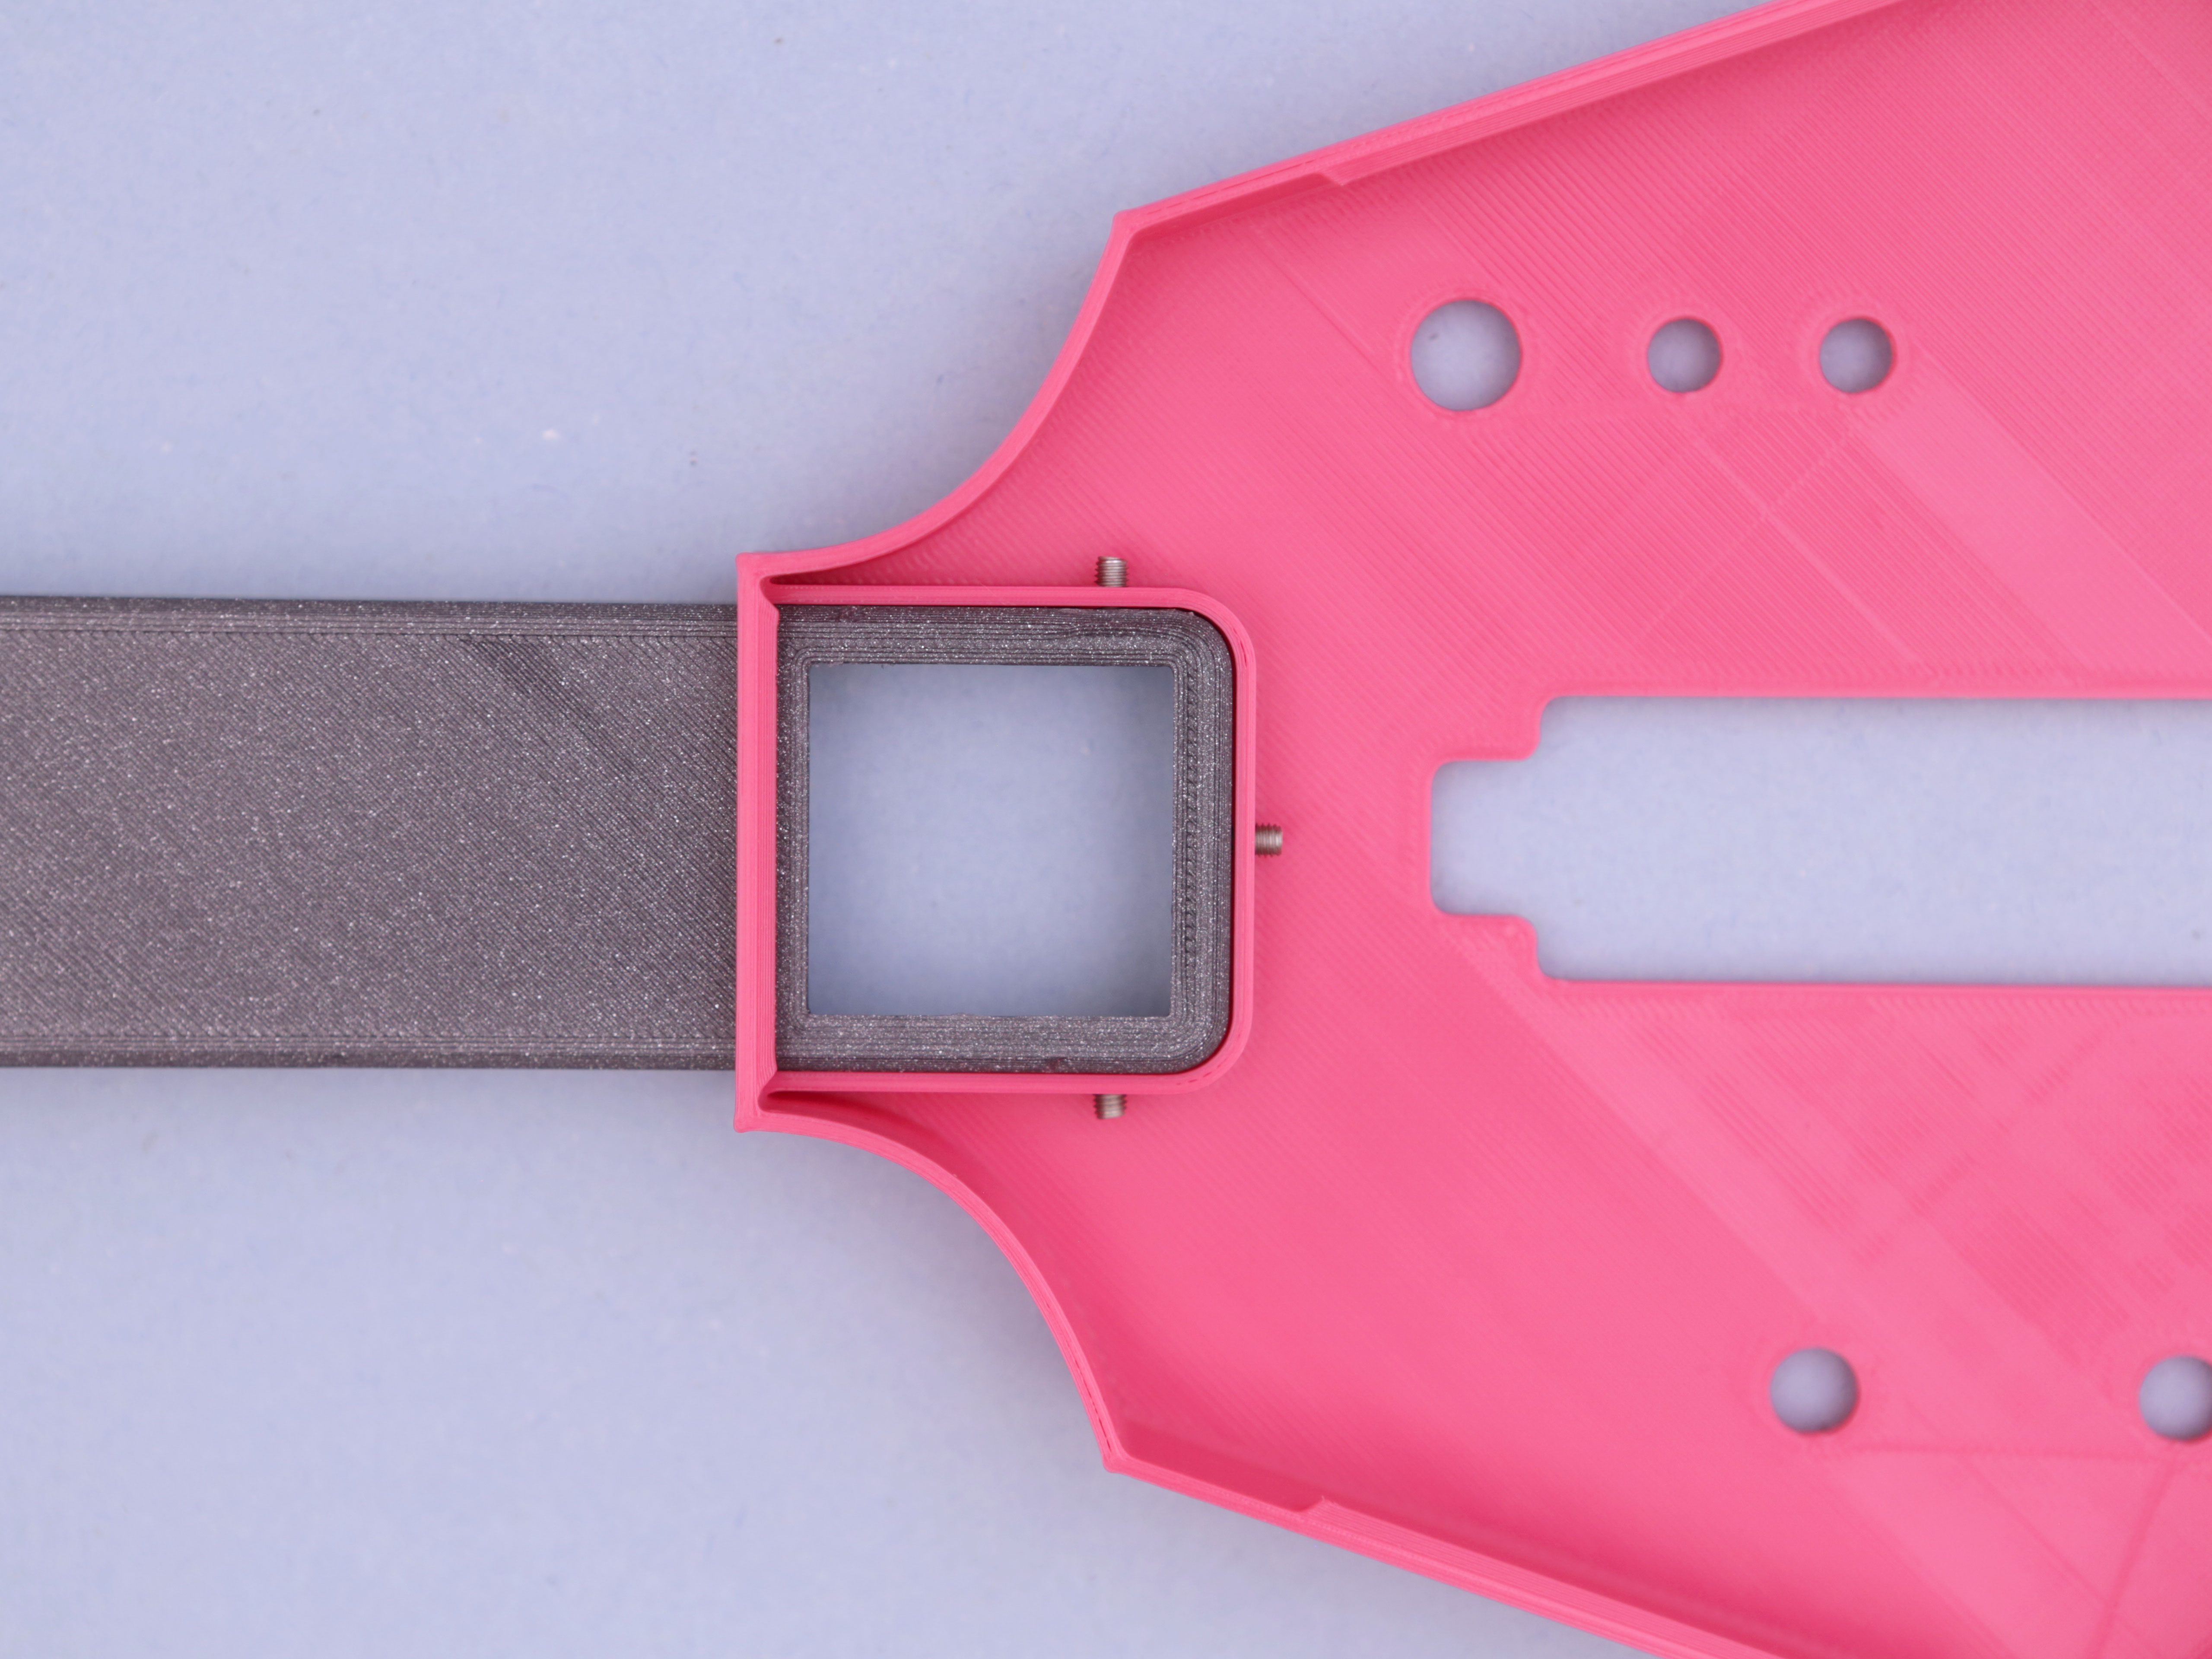 3d_printing_body-neck-screws-install.jpg